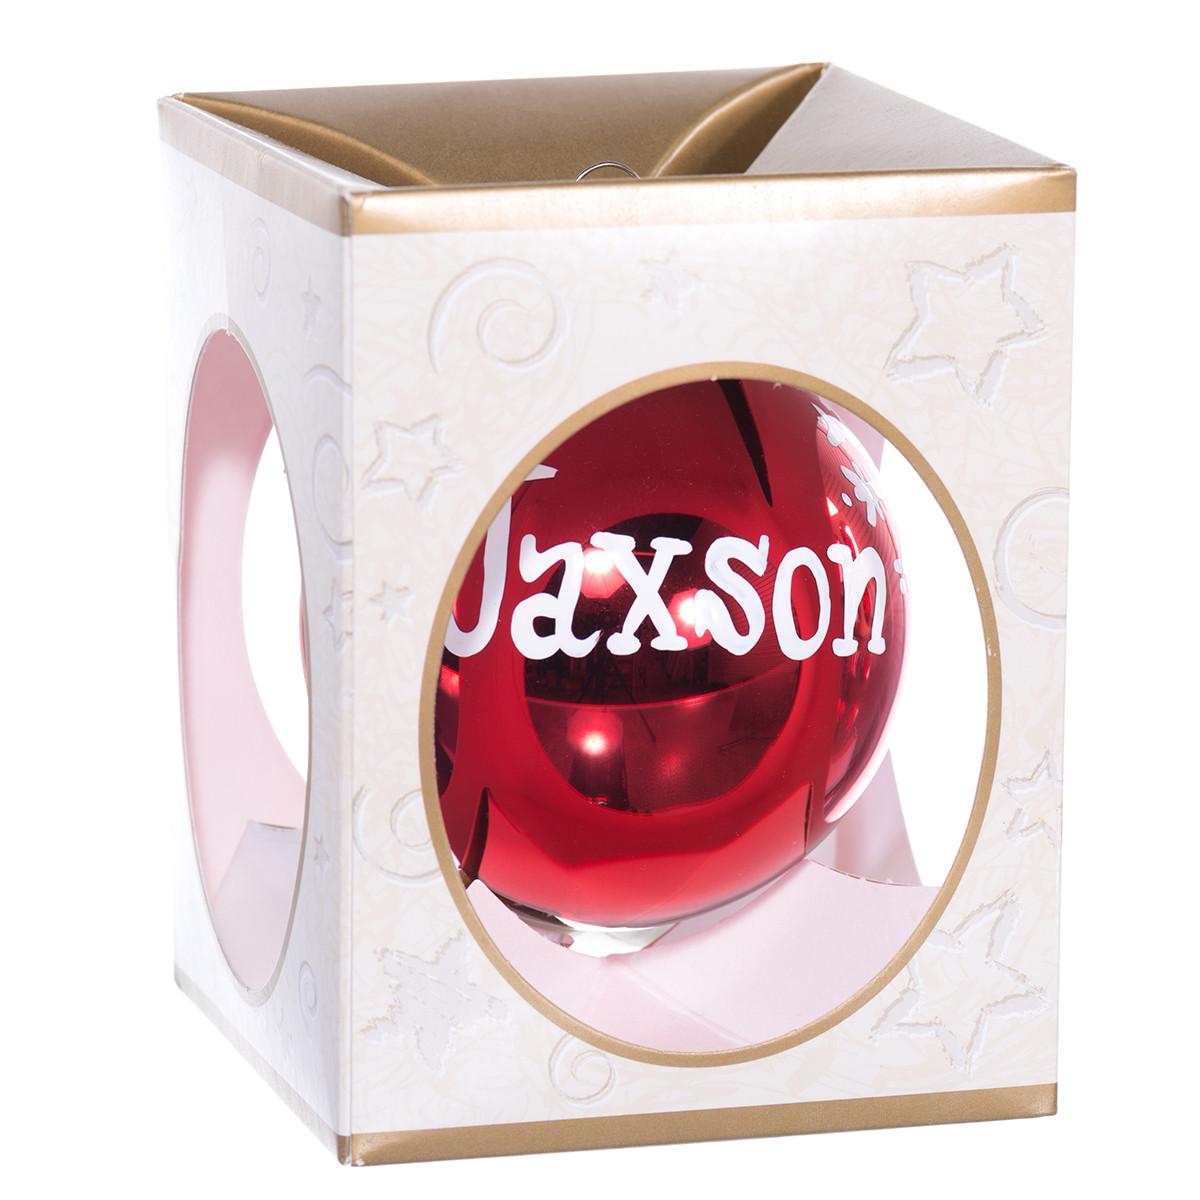 Custom christmas ball ornaments - Personalized Christmas Ball Ornament